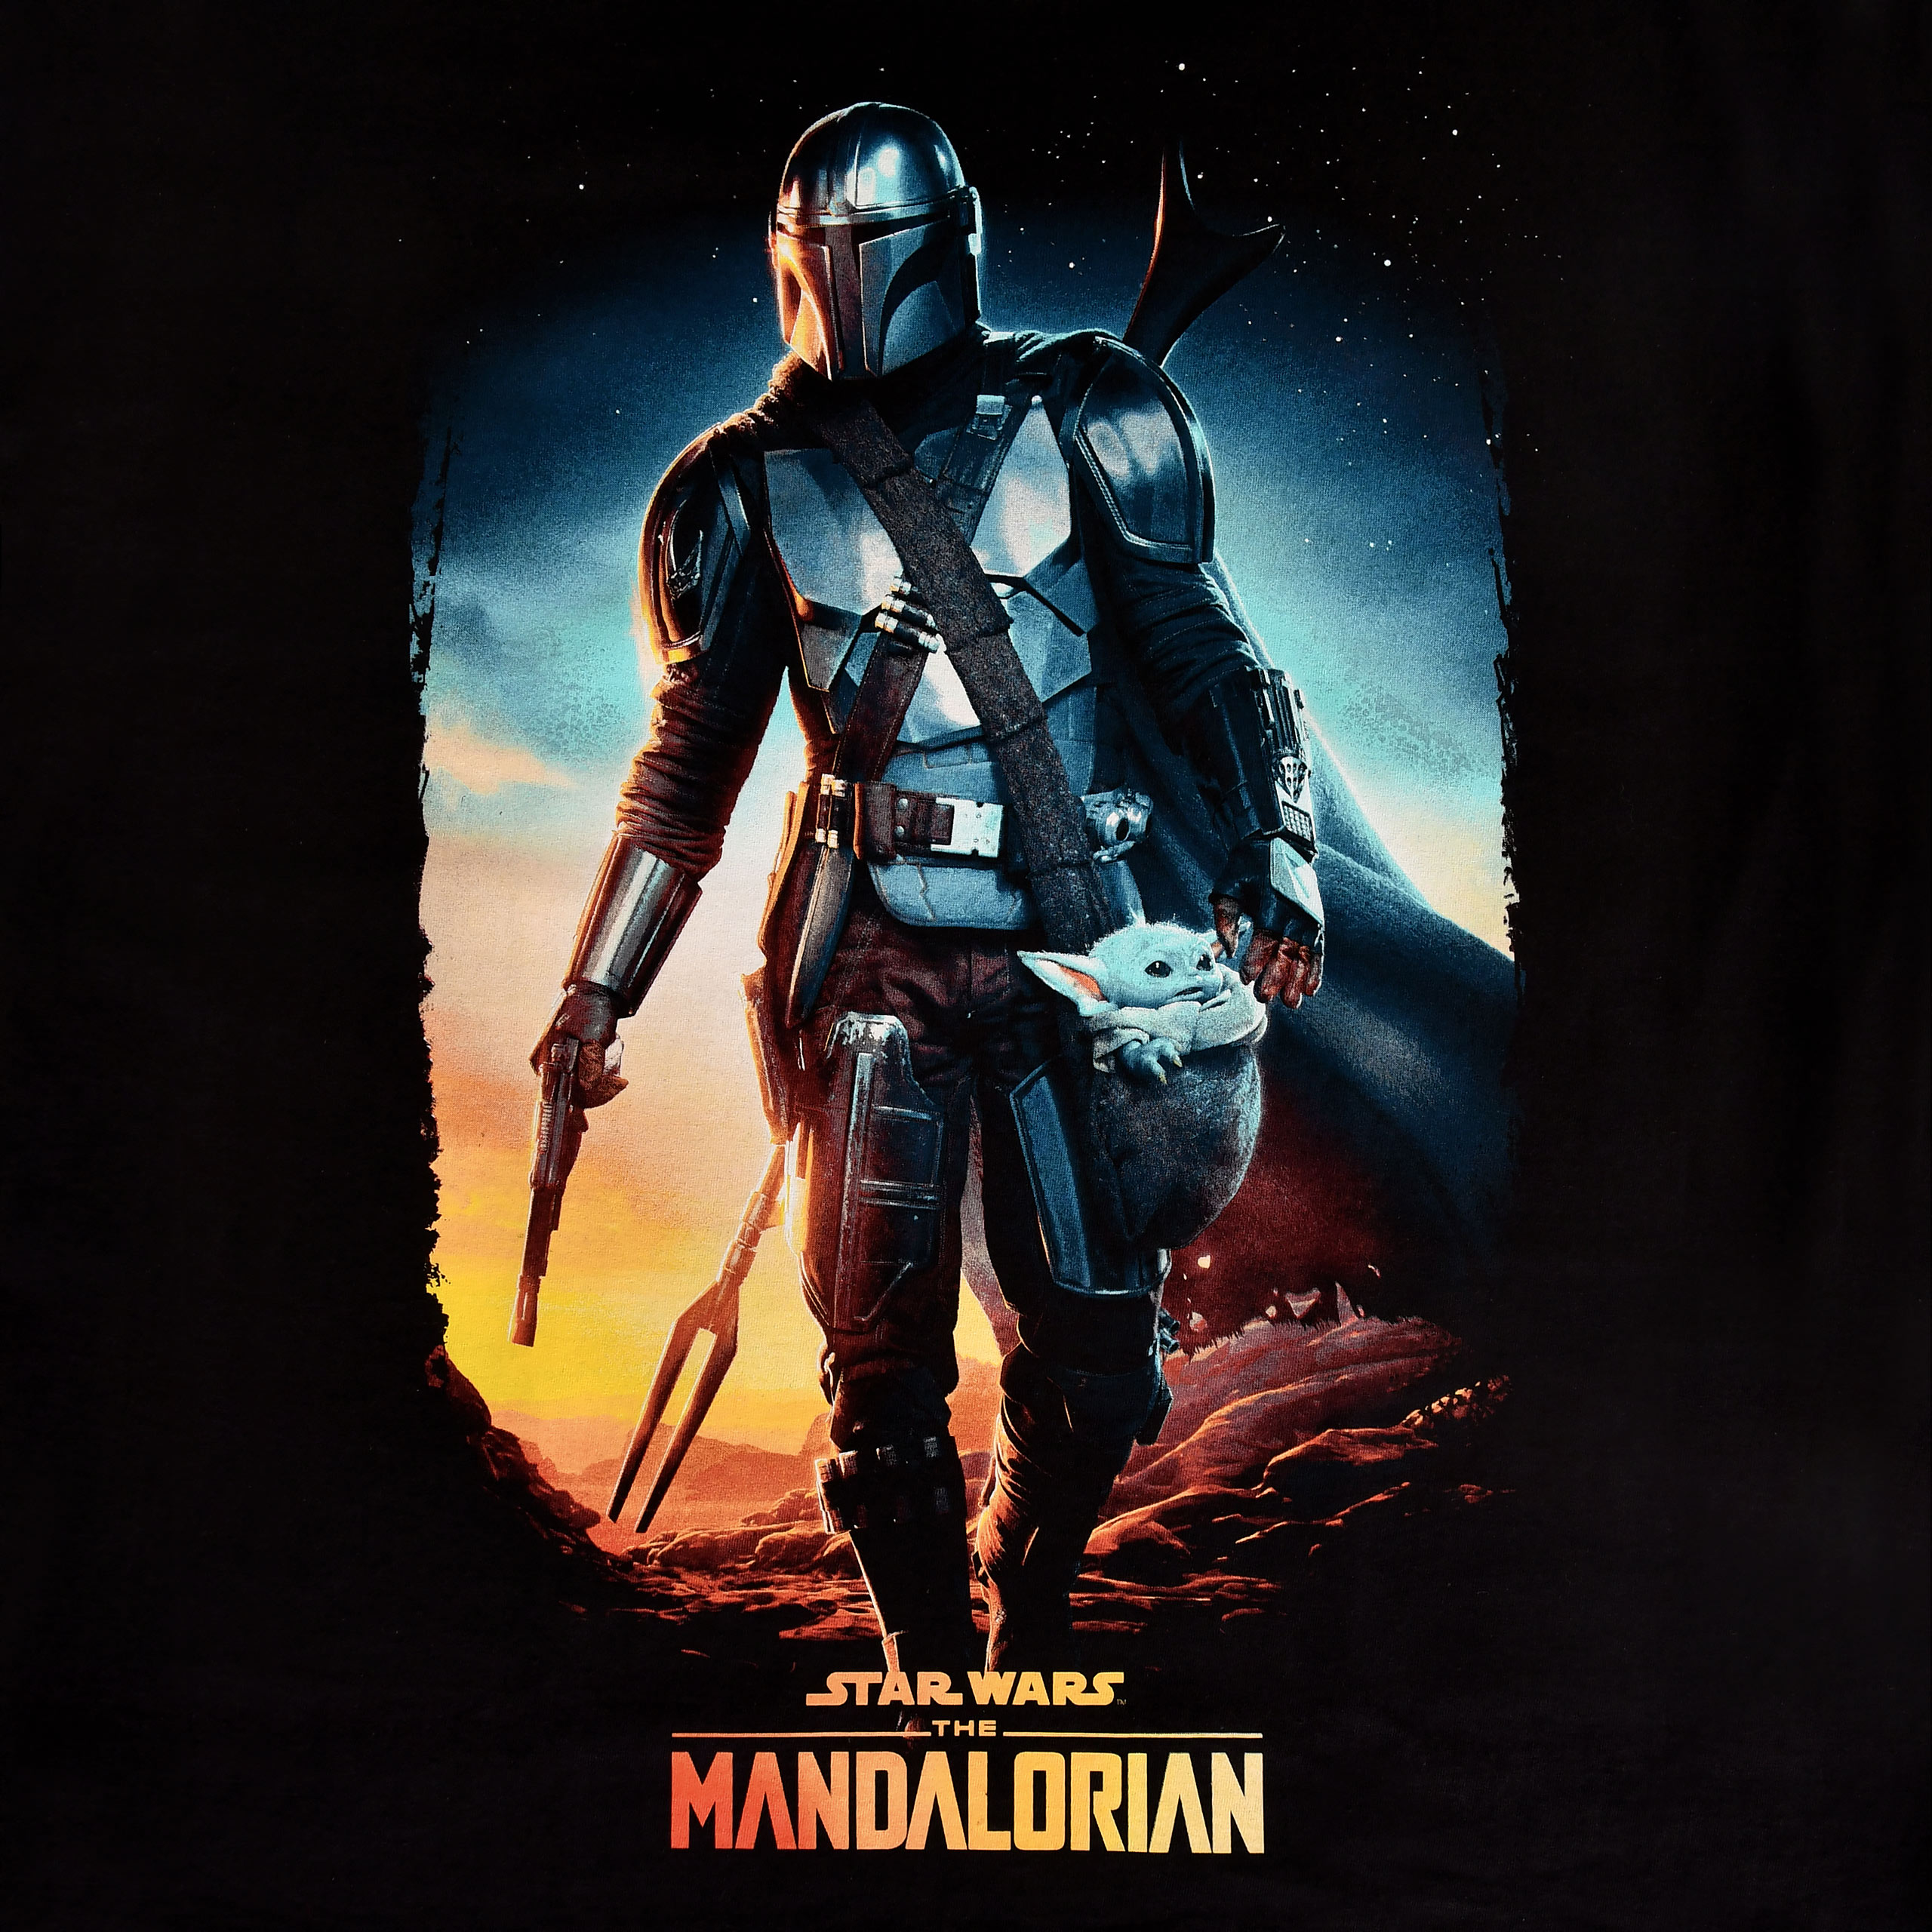 Through The Galaxy T-Shirt schwarz - Star Wars Mandalorian